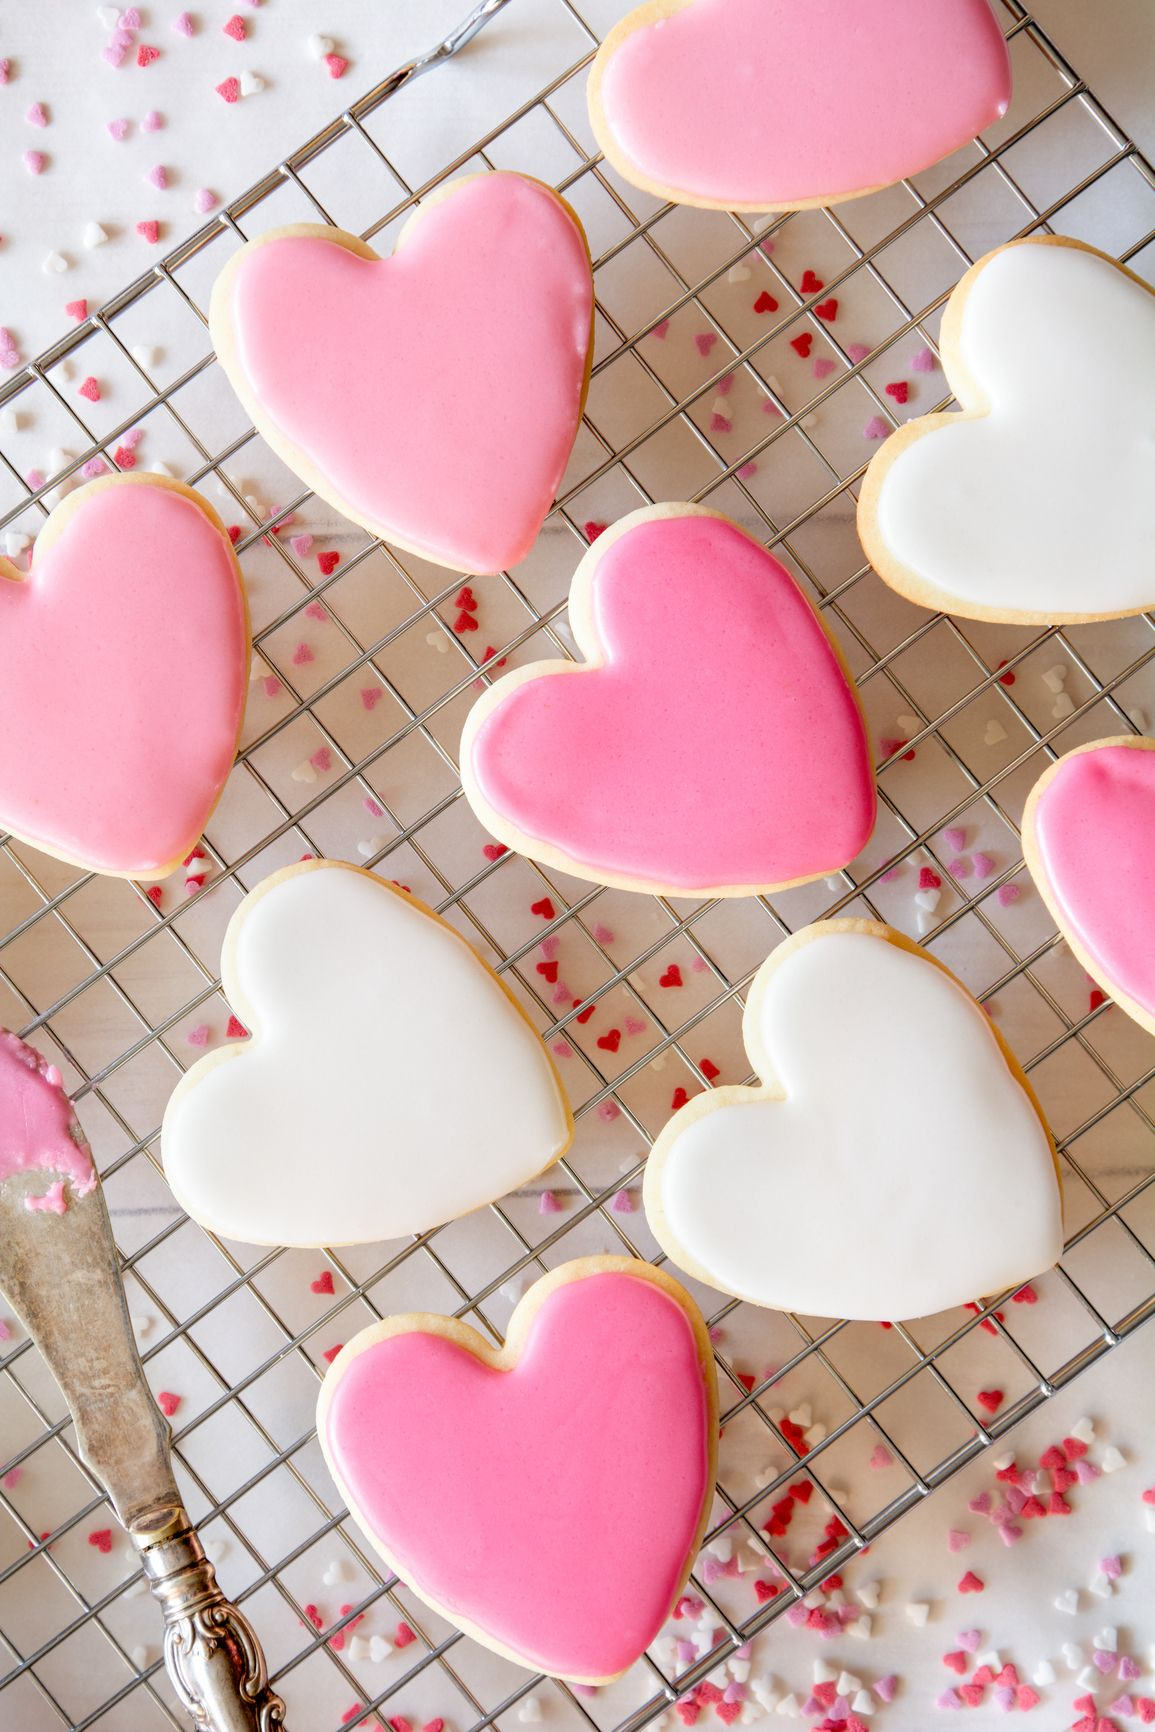 Valentine's Day Heart-Shaped Sugar Cookies | Stella & Dot. #valentinesday #cookie #dessert #sweets